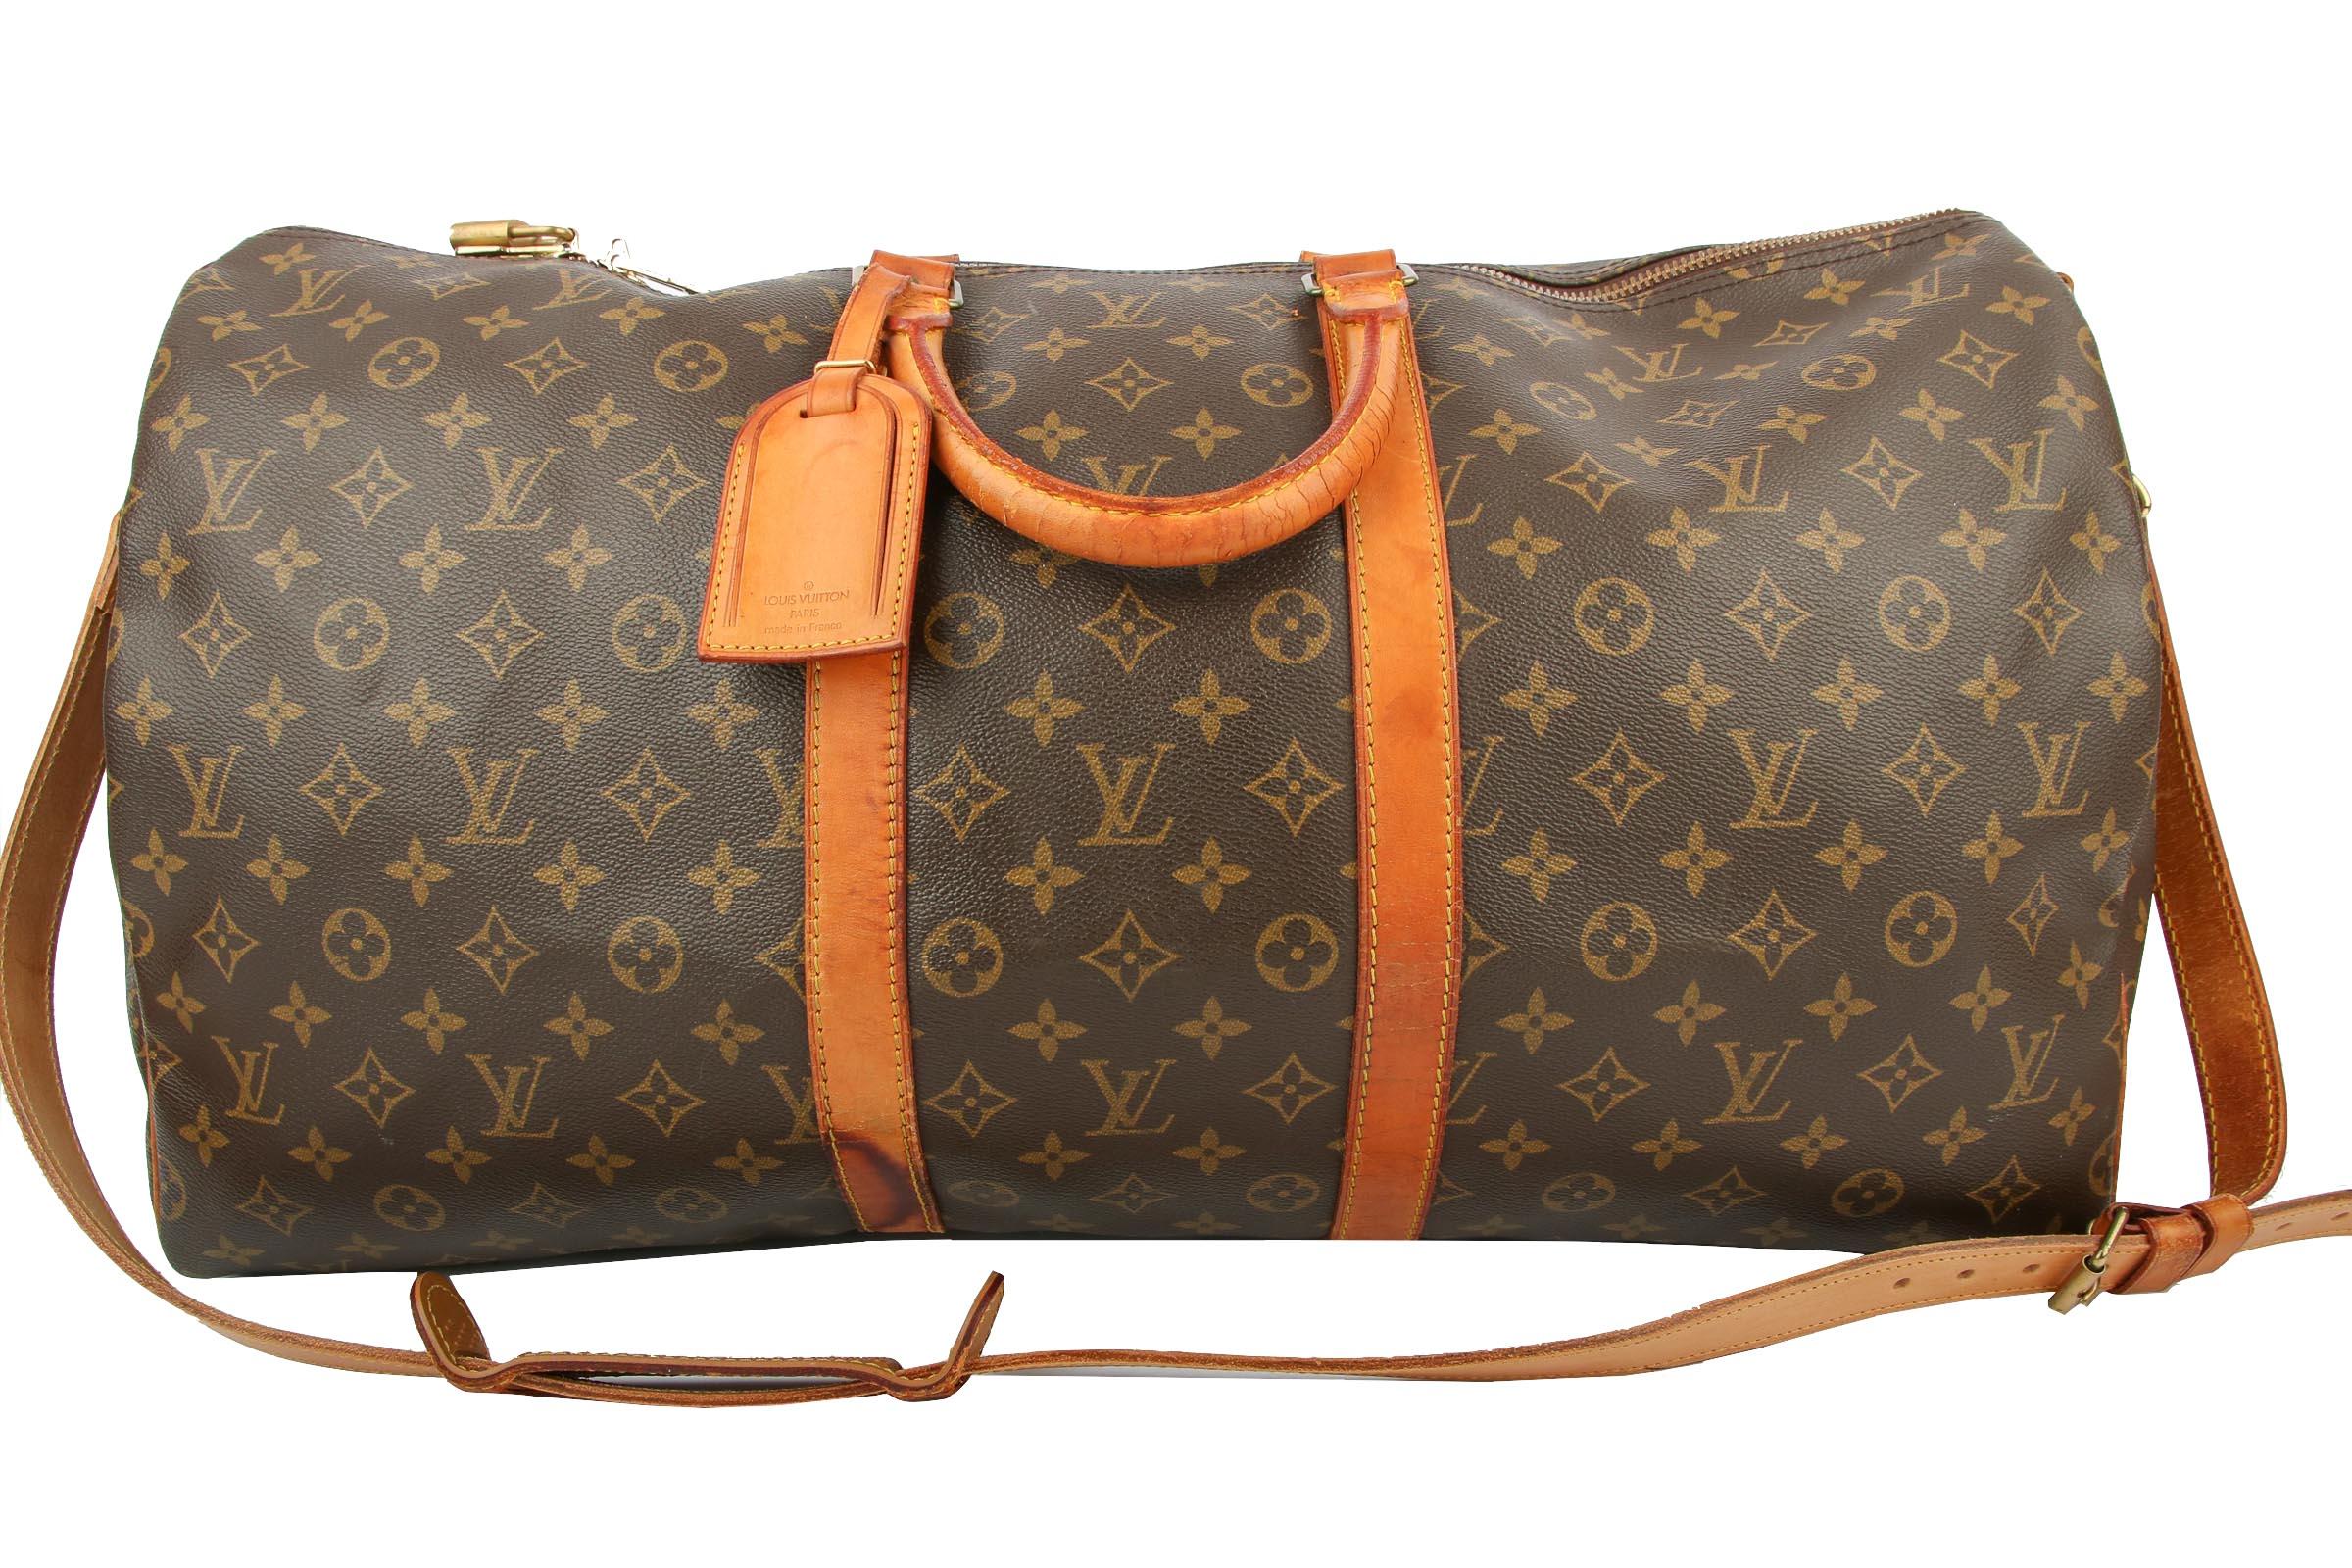 176c6134fa5bd Louis Vuitton Keepall Bandouliere 55 Monogram Canvas